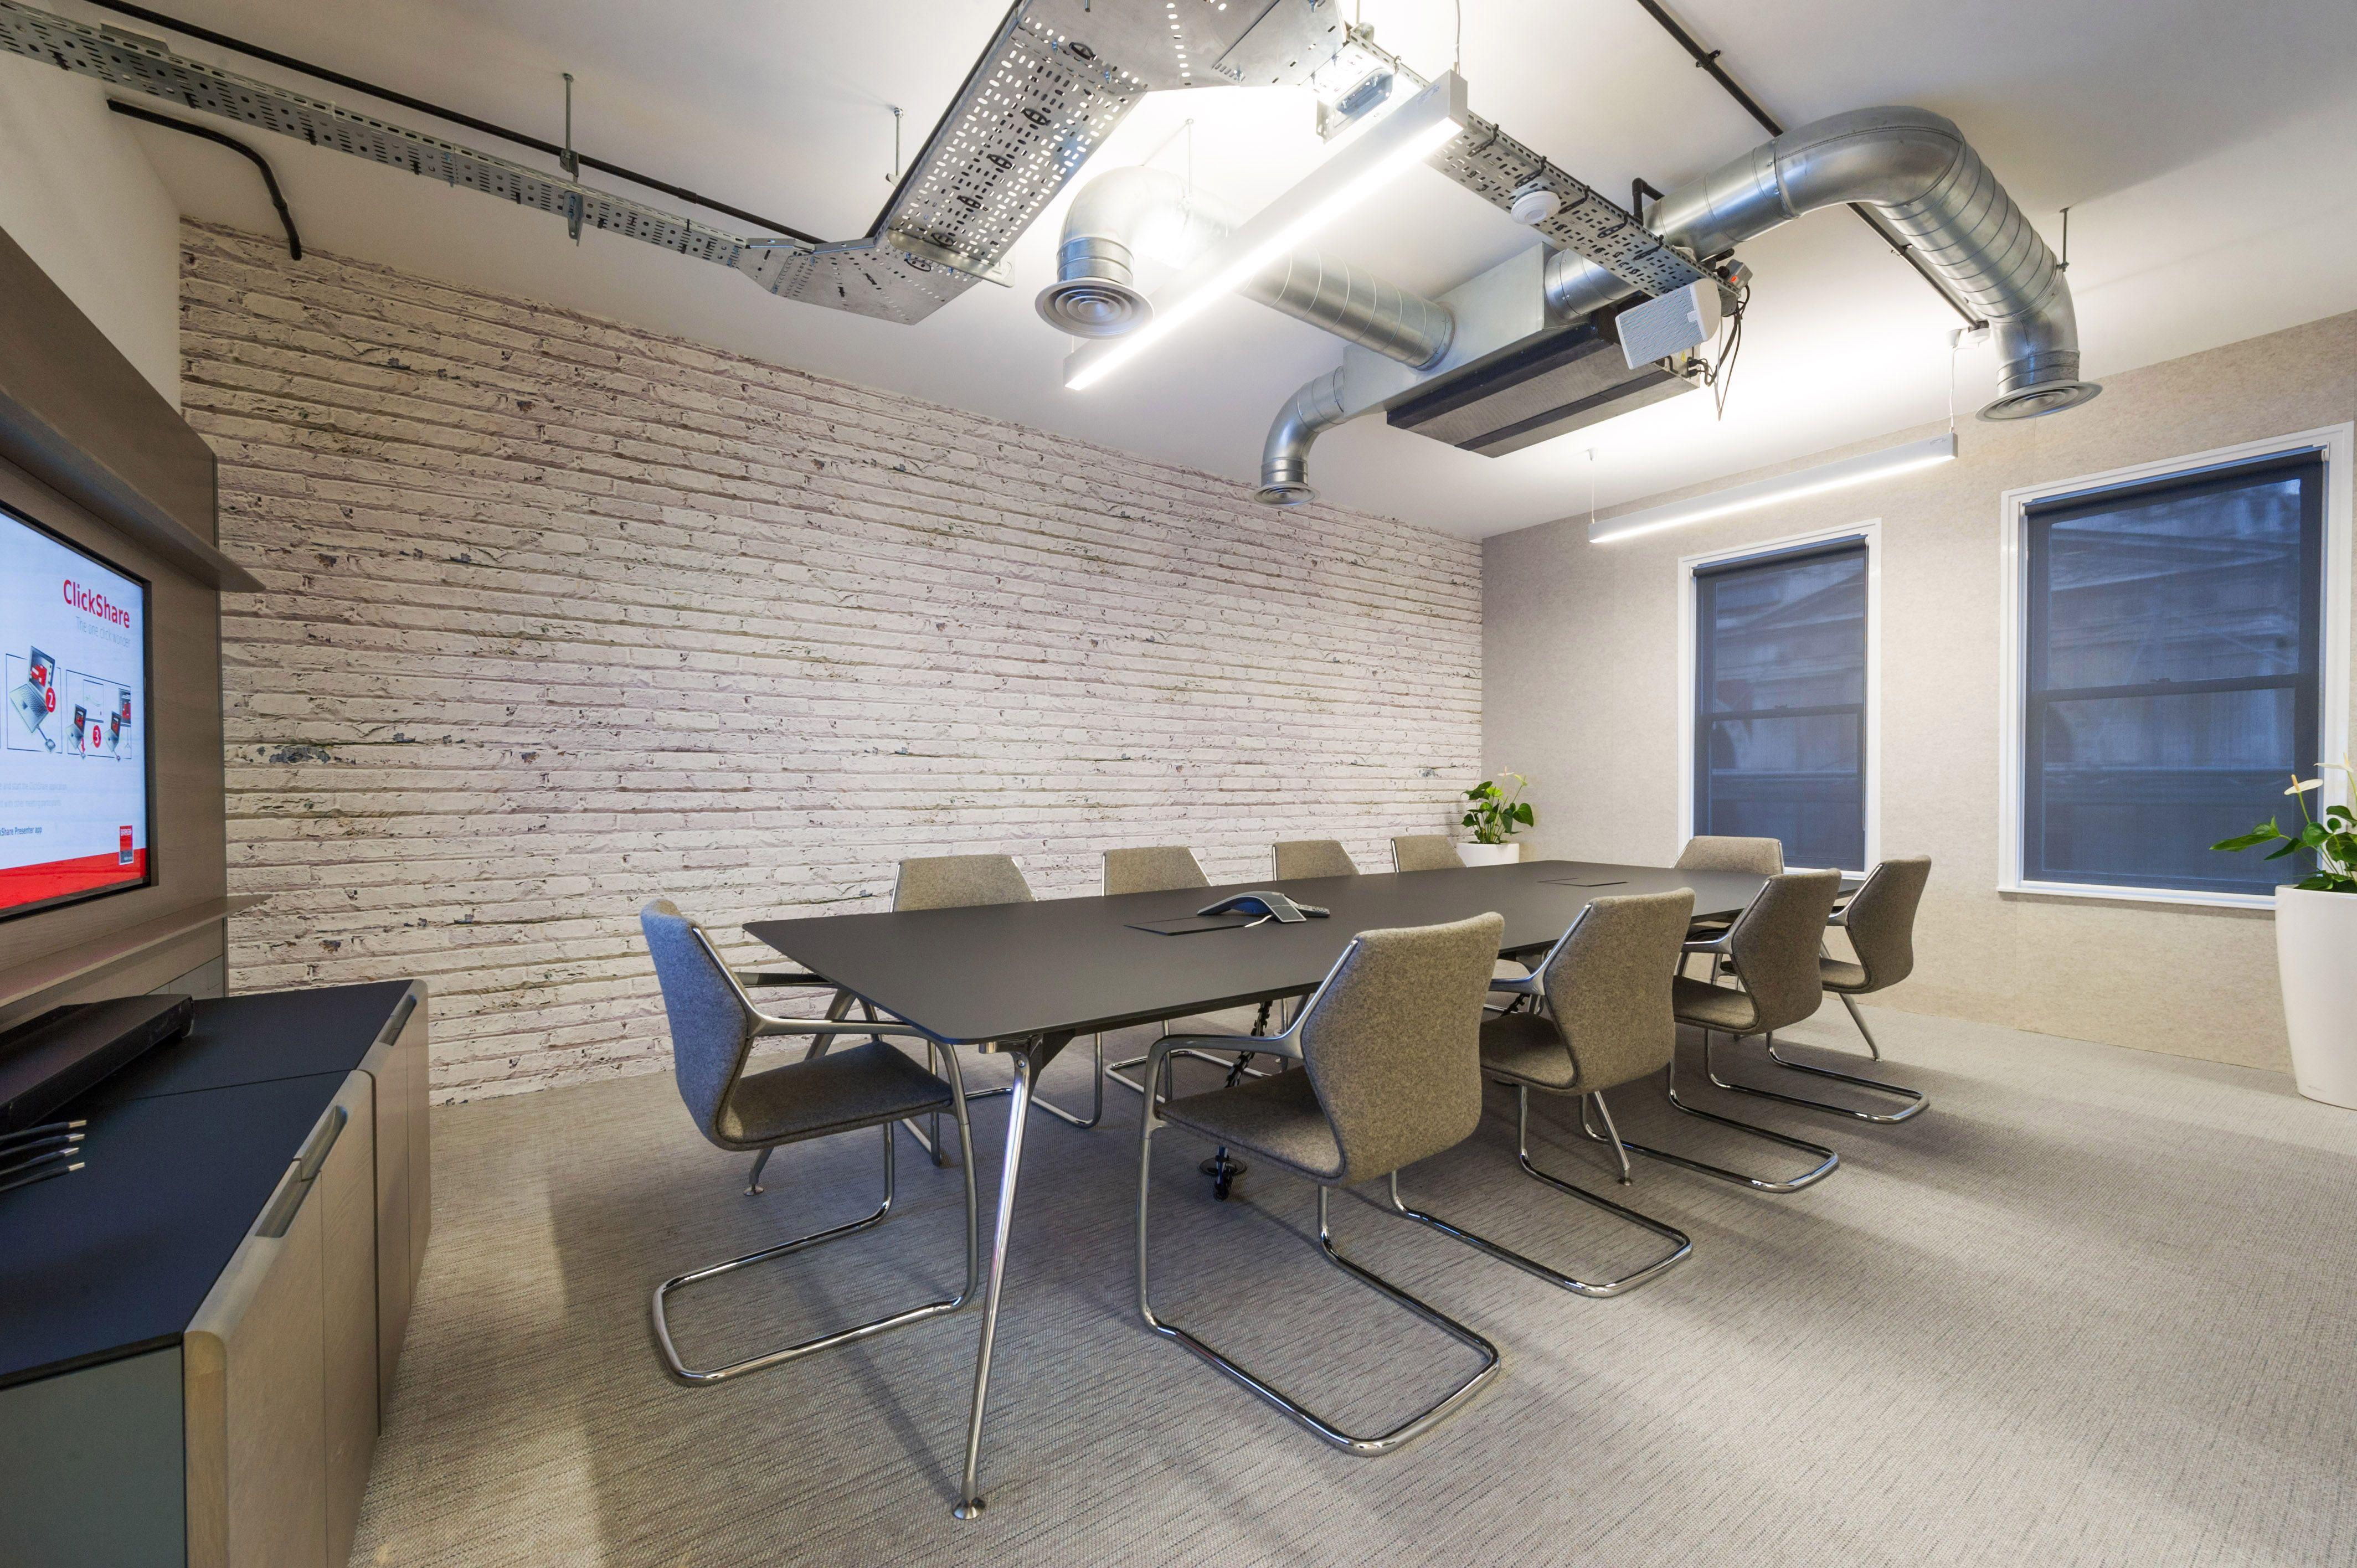 Omega meeting table in solid Fenix and Media wall in Oak veneer and Fenix - on…